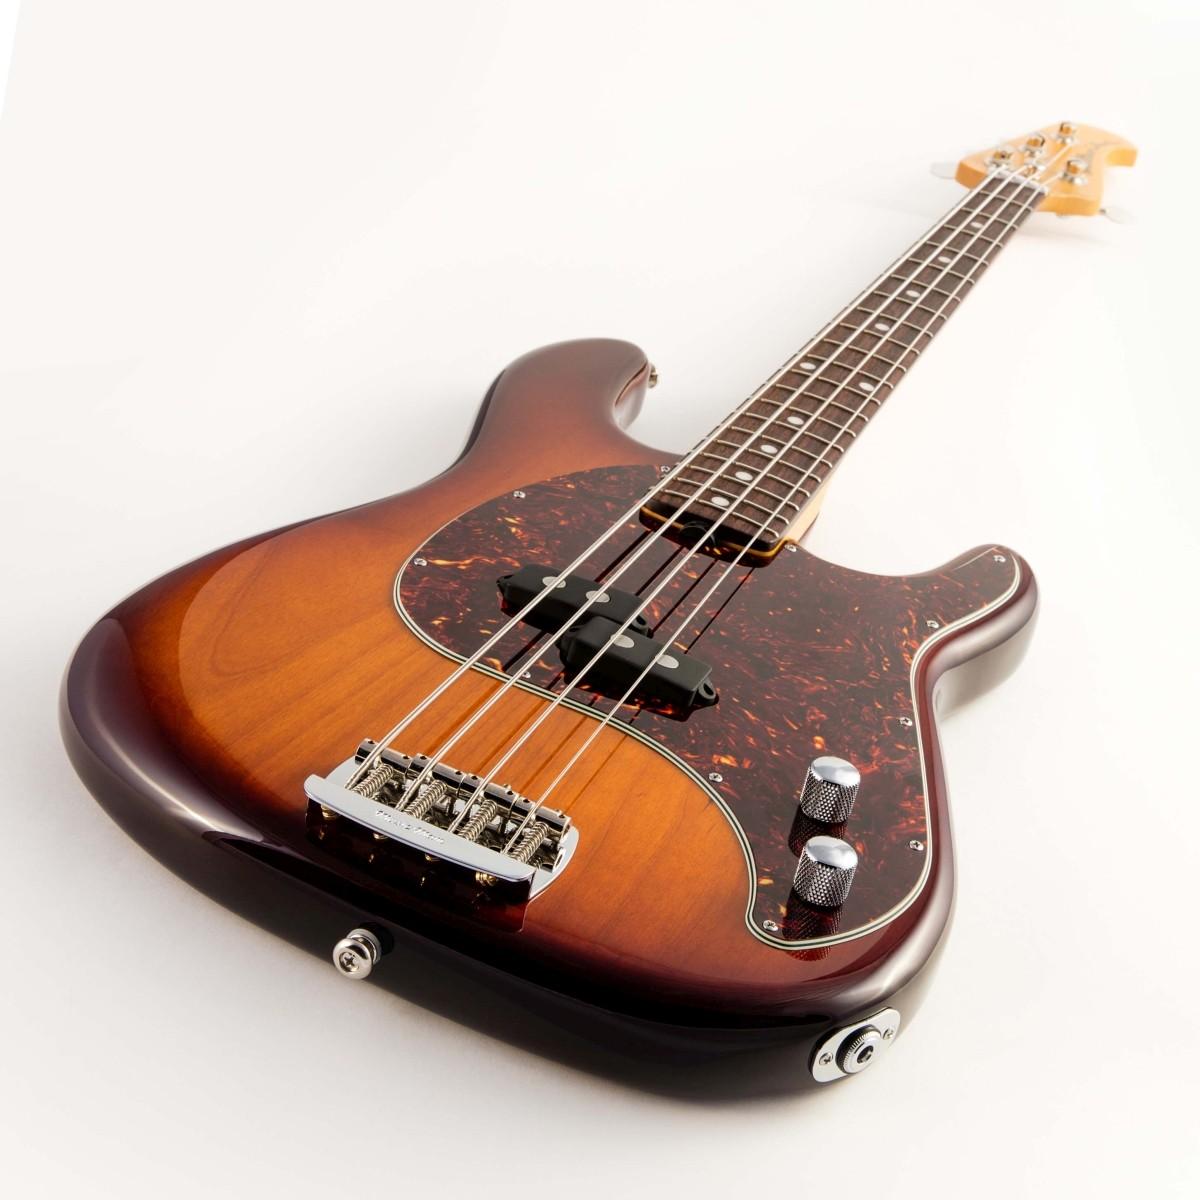 MUSICMAN / Cutlass Bass Heritage Tobacco Burst Rosewood Fingerboard ミュージックマン《値下げしました!》